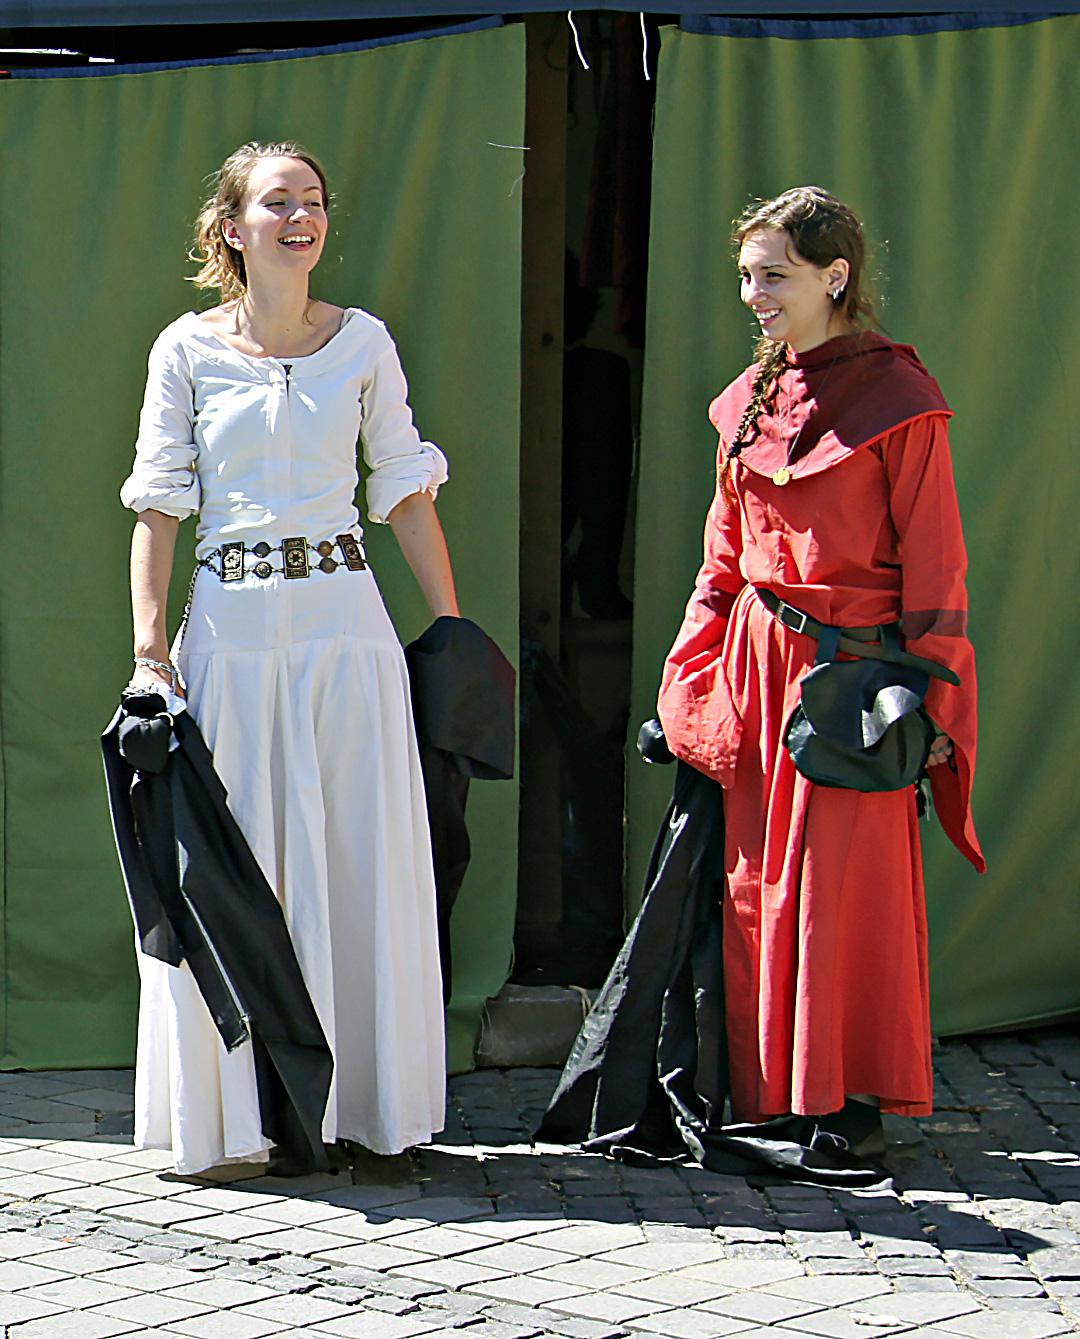 In old times, ladies had better fashion taste. Photo by Ovidiu Balaj